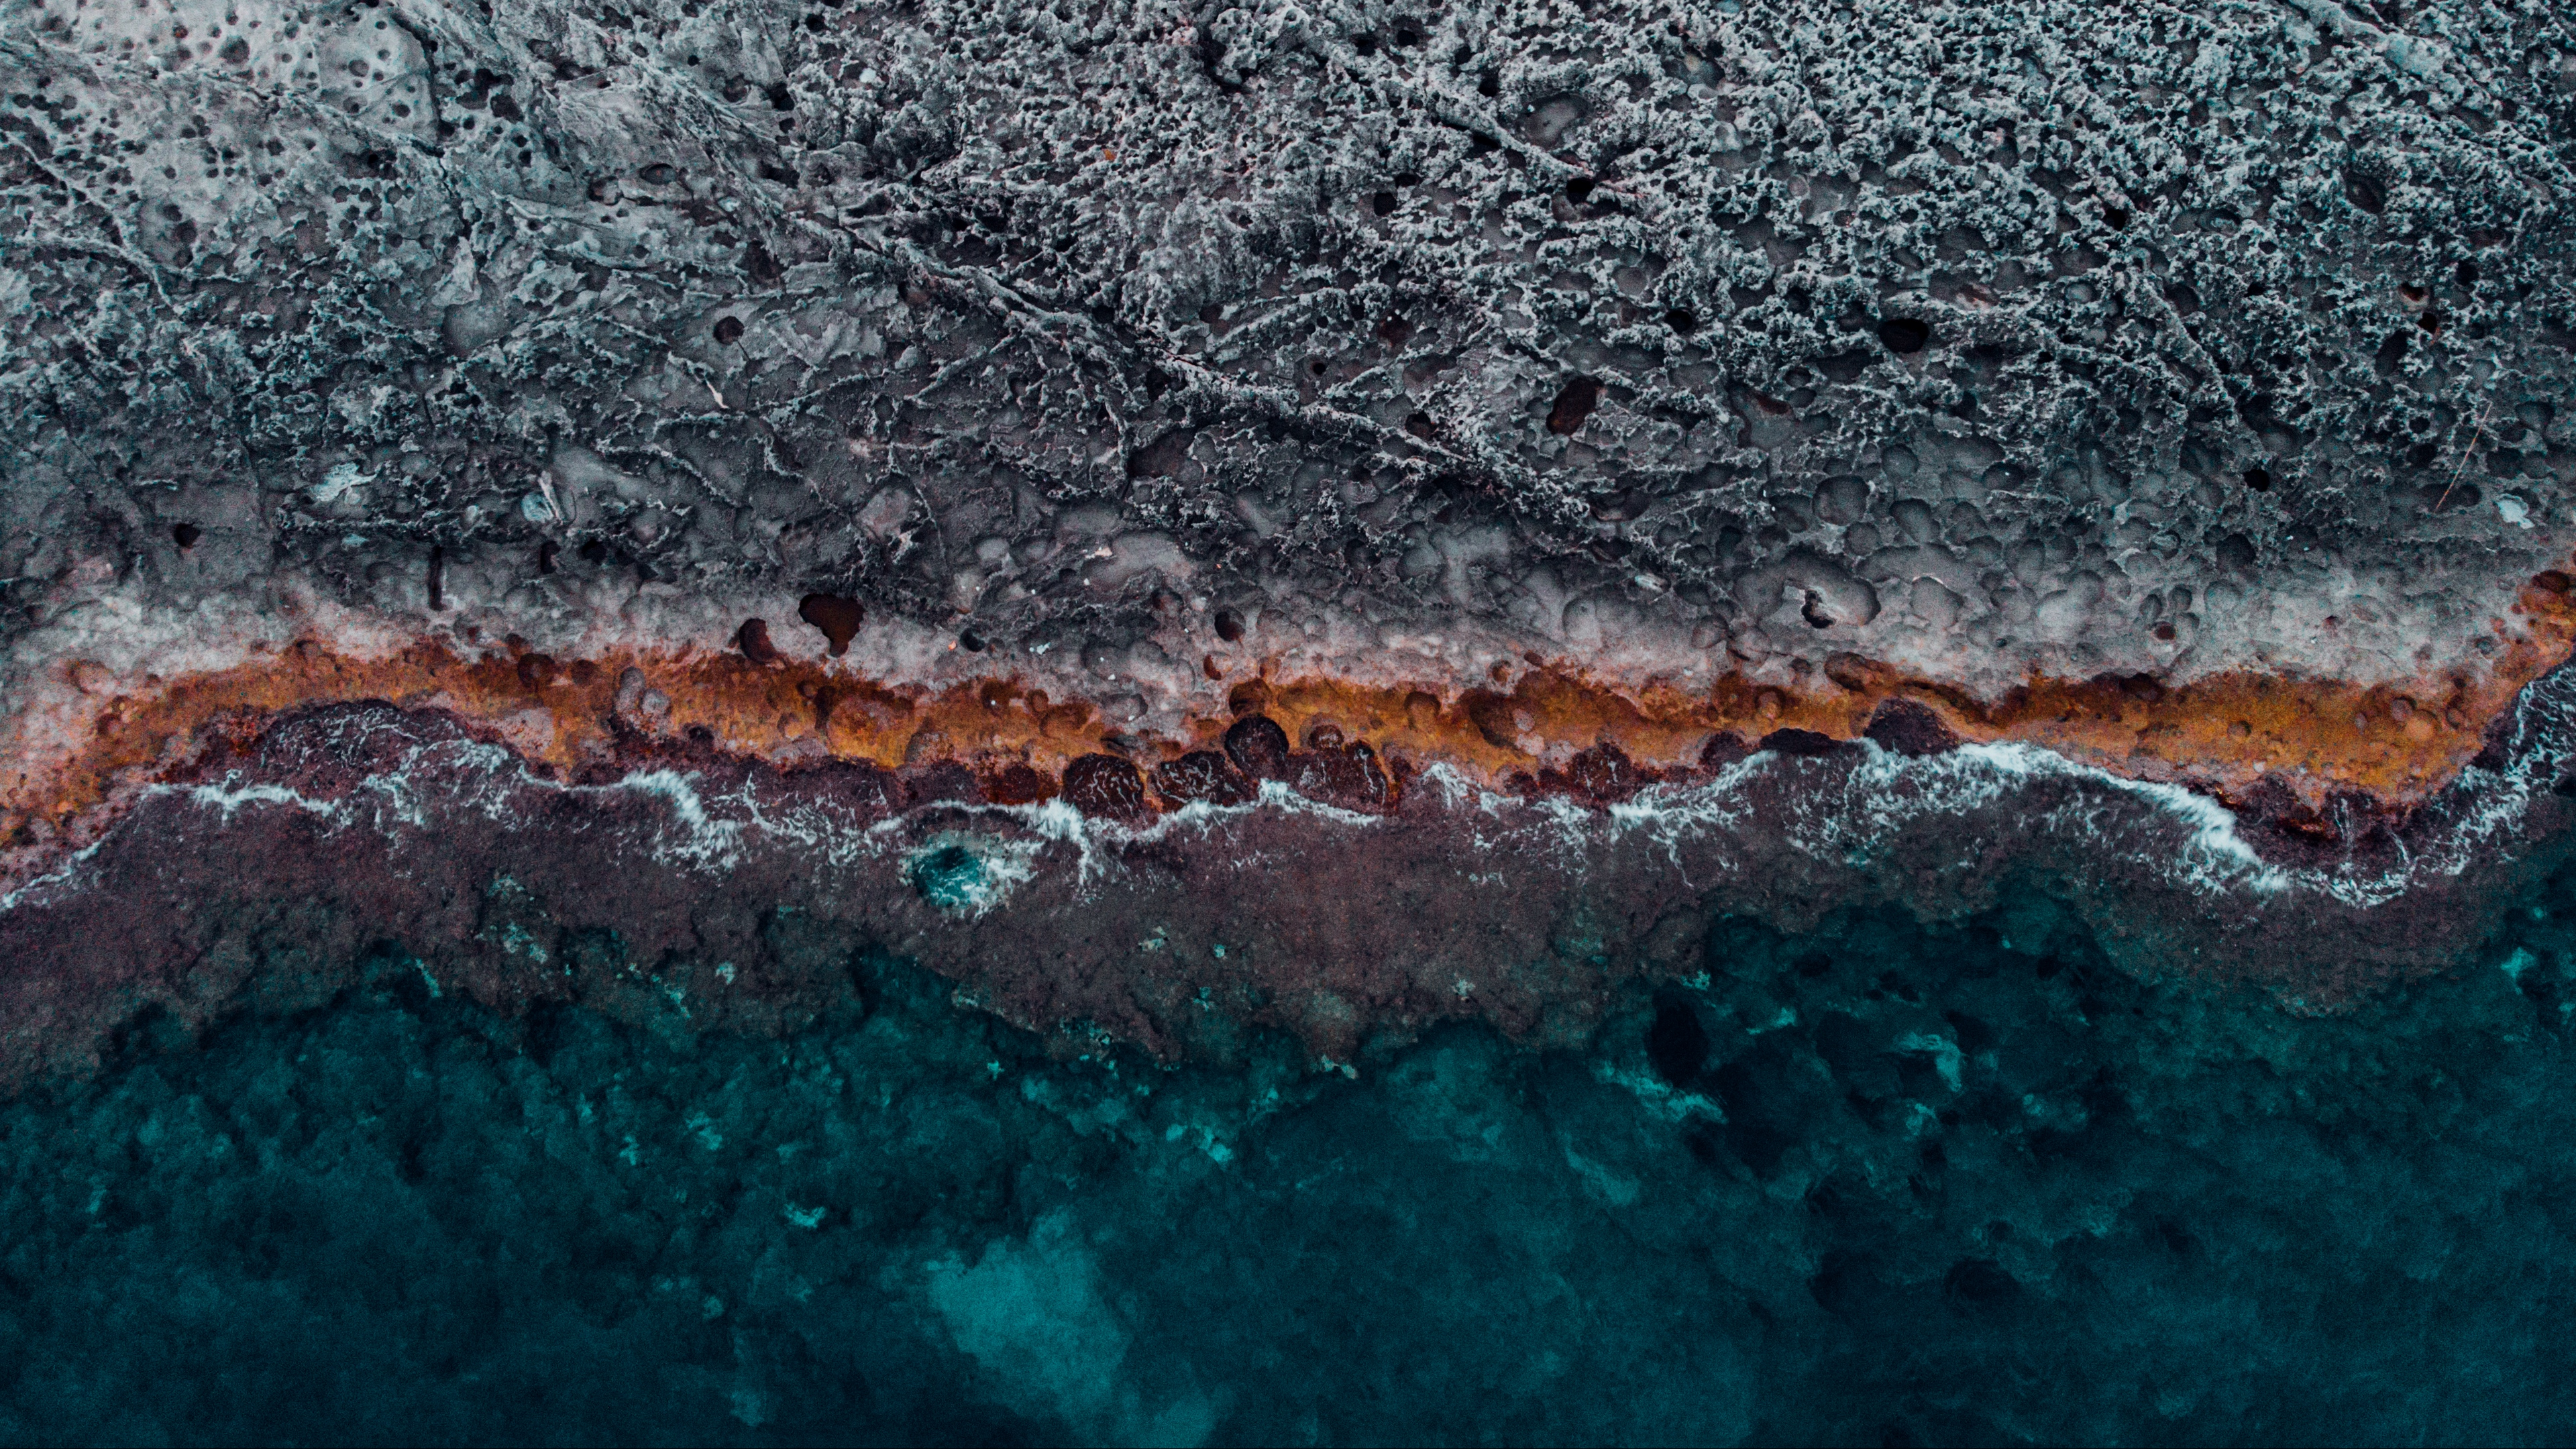 ocean coast aerial view water stones surface ribbed 4k 1541113732 - ocean, coast, aerial view, water, stones, surface, ribbed 4k - Ocean, Coast, aerial view